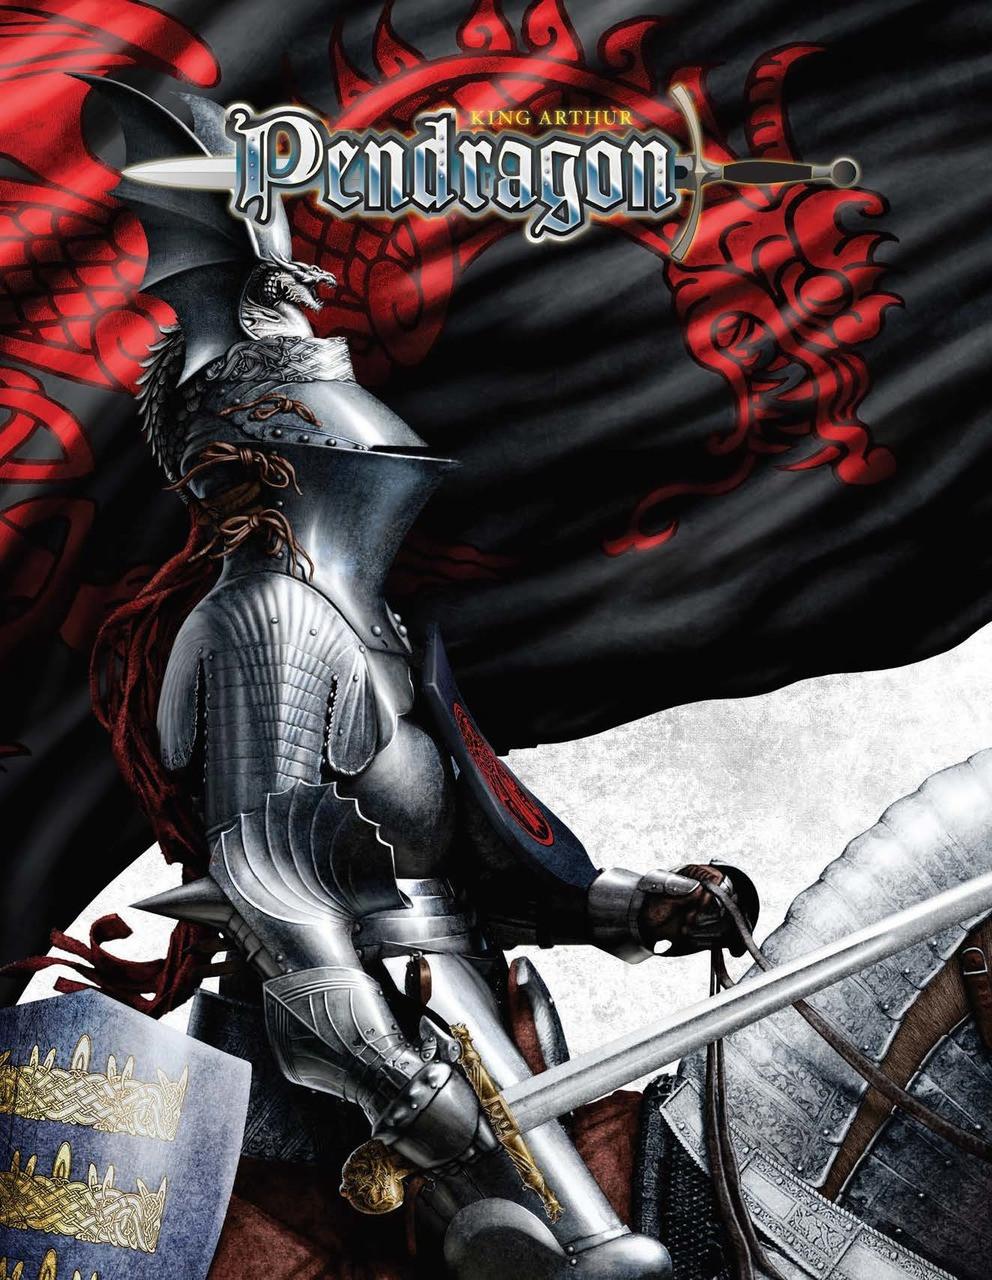 King Arthur Pendragon (Pendragon 5th Edition)